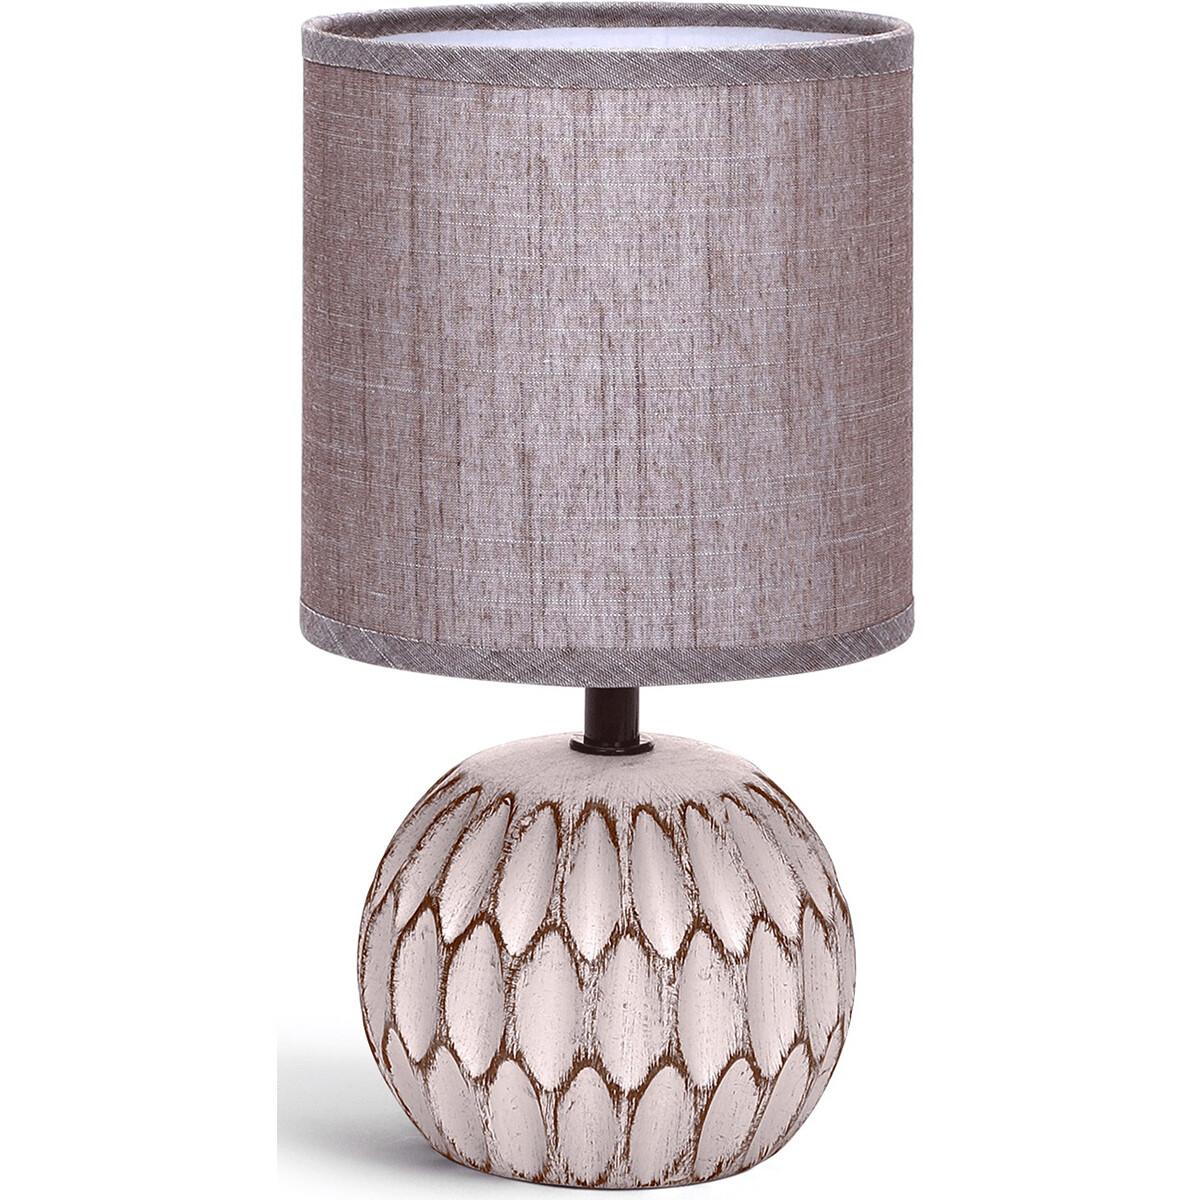 LED Tafellamp - Tafelverlichting - Aigi Traplon - E14 Fitting - Rond - Mat Bruin - Keramiek